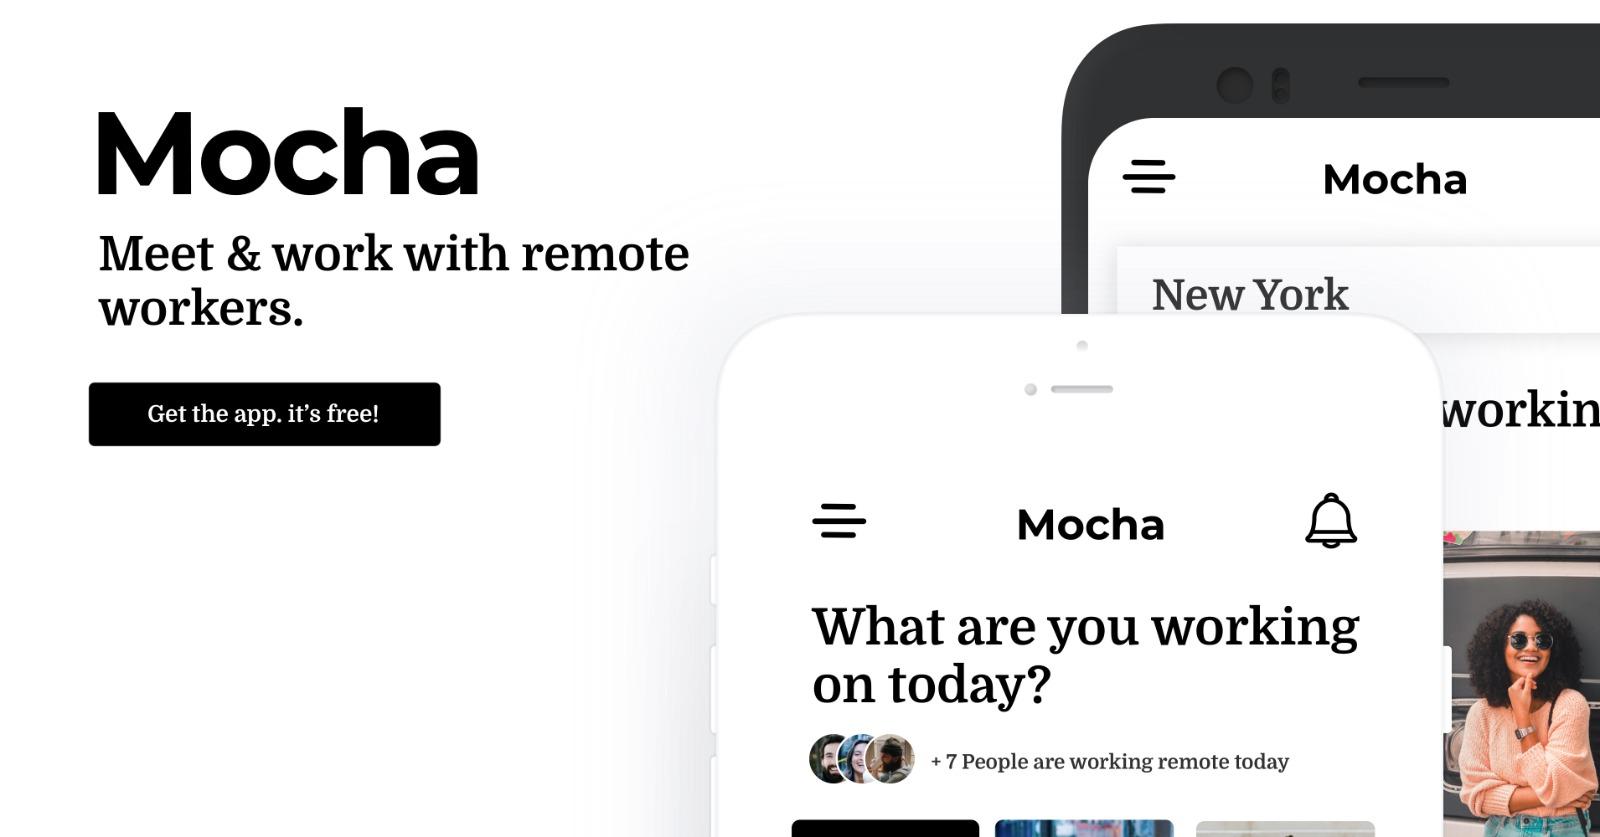 Mocha App Official Launch